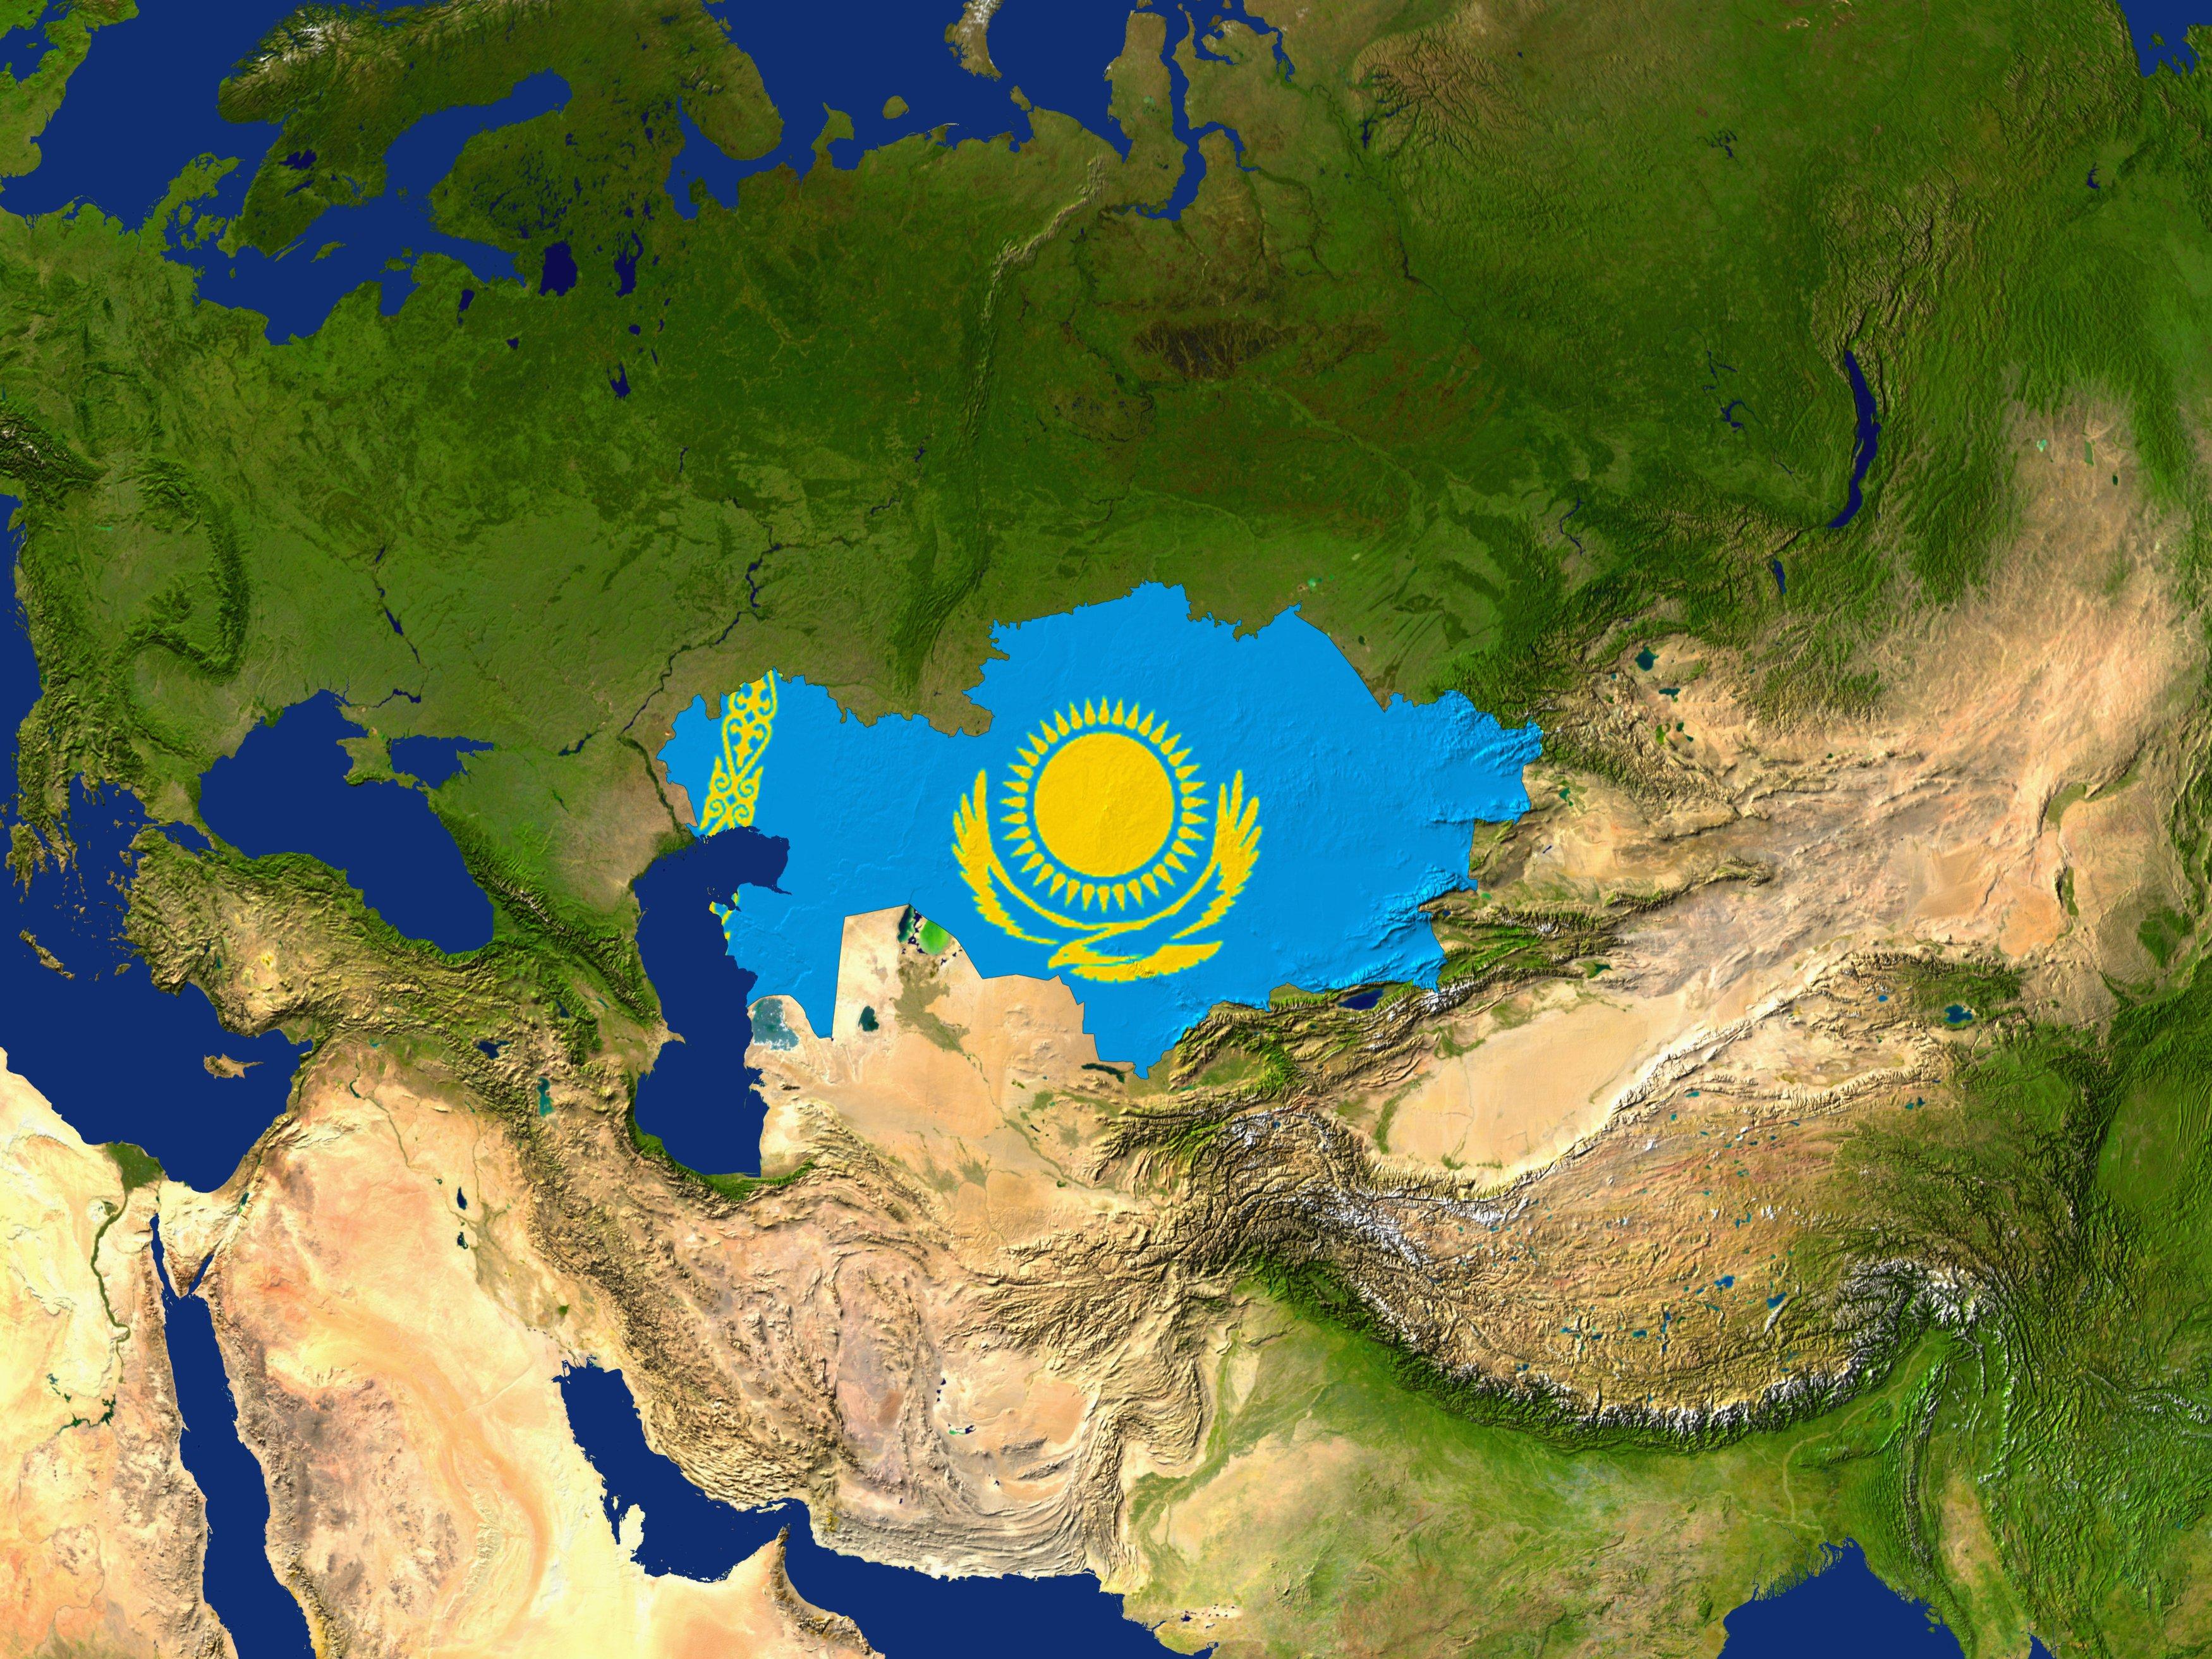 Картинки казахстан, бесплатные фото ...: pictures11.ru/kartinki-kazahstan.html